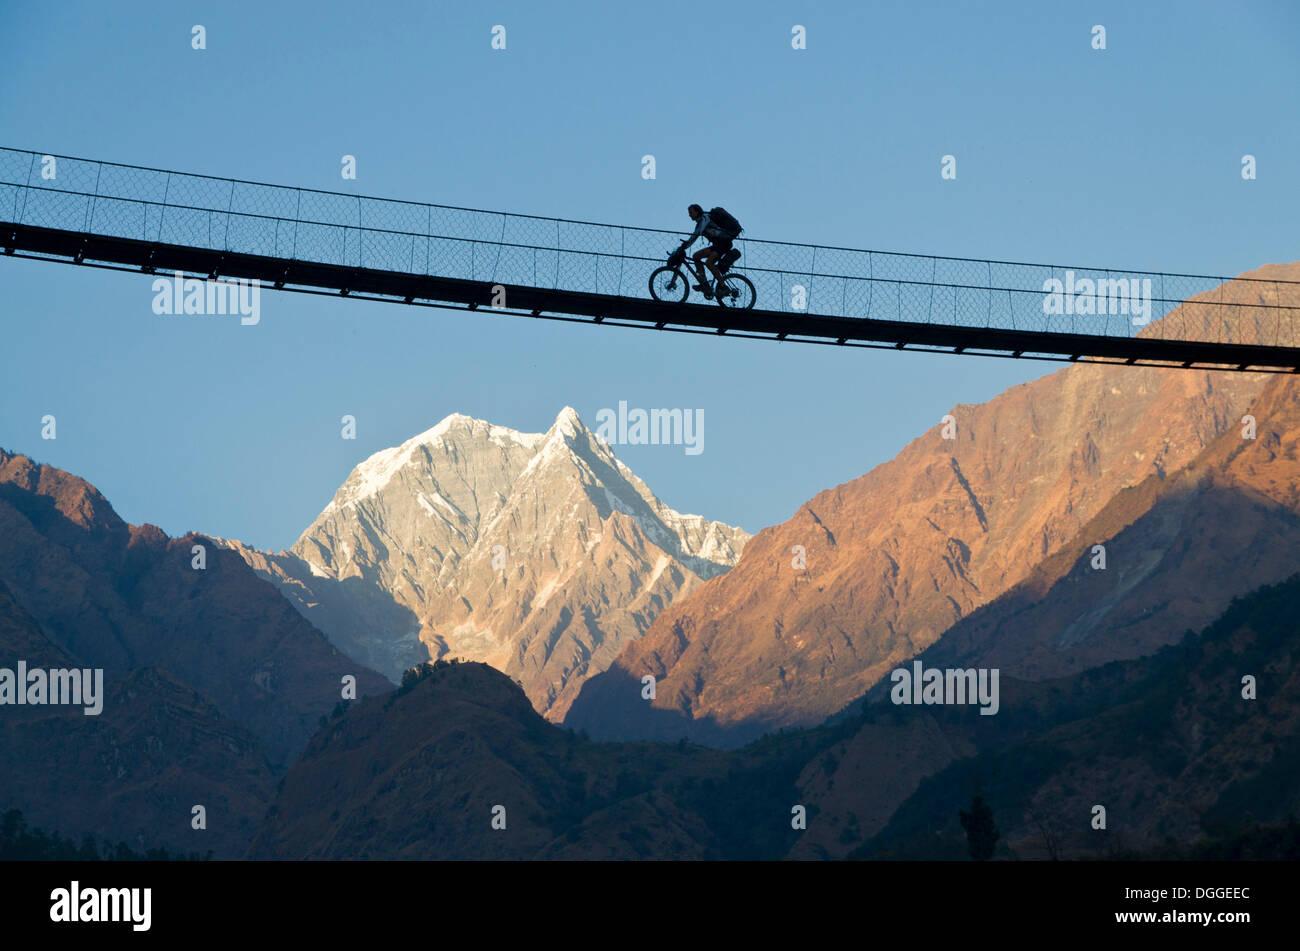 Cyclist crossing a suspension Bridge over Kali Ghandaki Valley, Nilgiri Mountain in the back, Tatopani, Annapurna - Stock Image